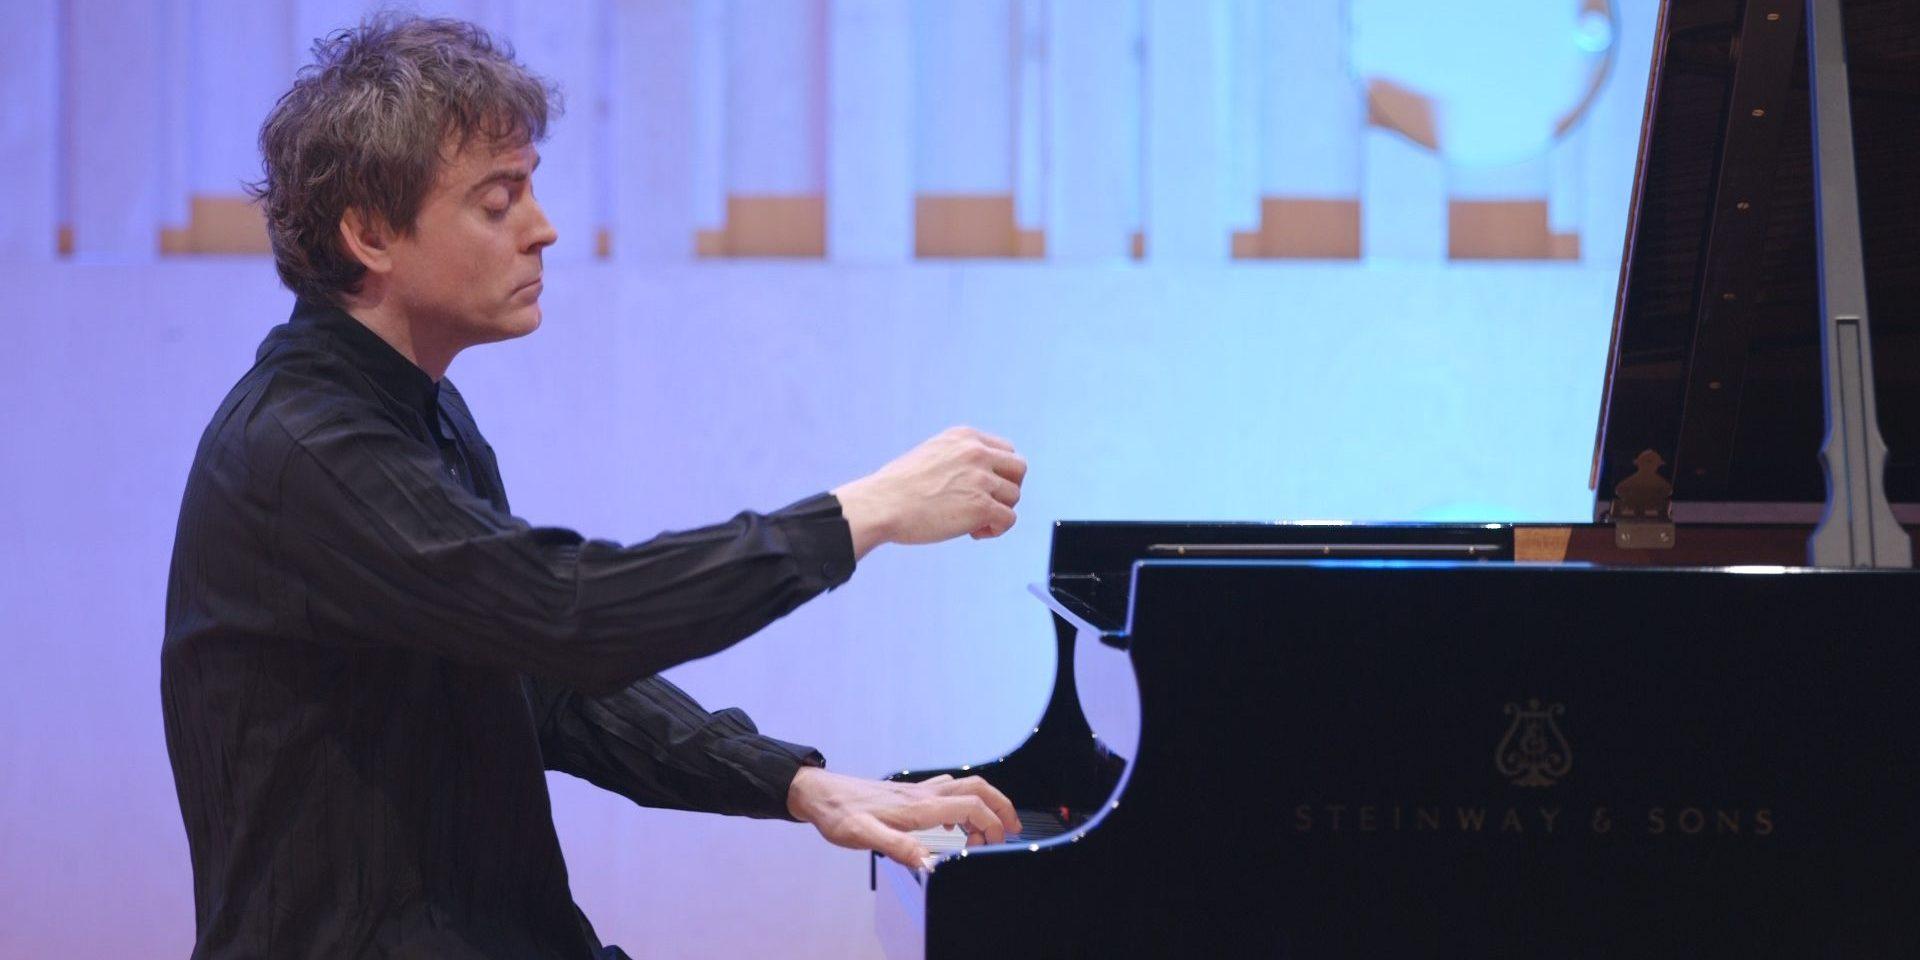 Mozart Piano Concerto No12 with Paul Lewis